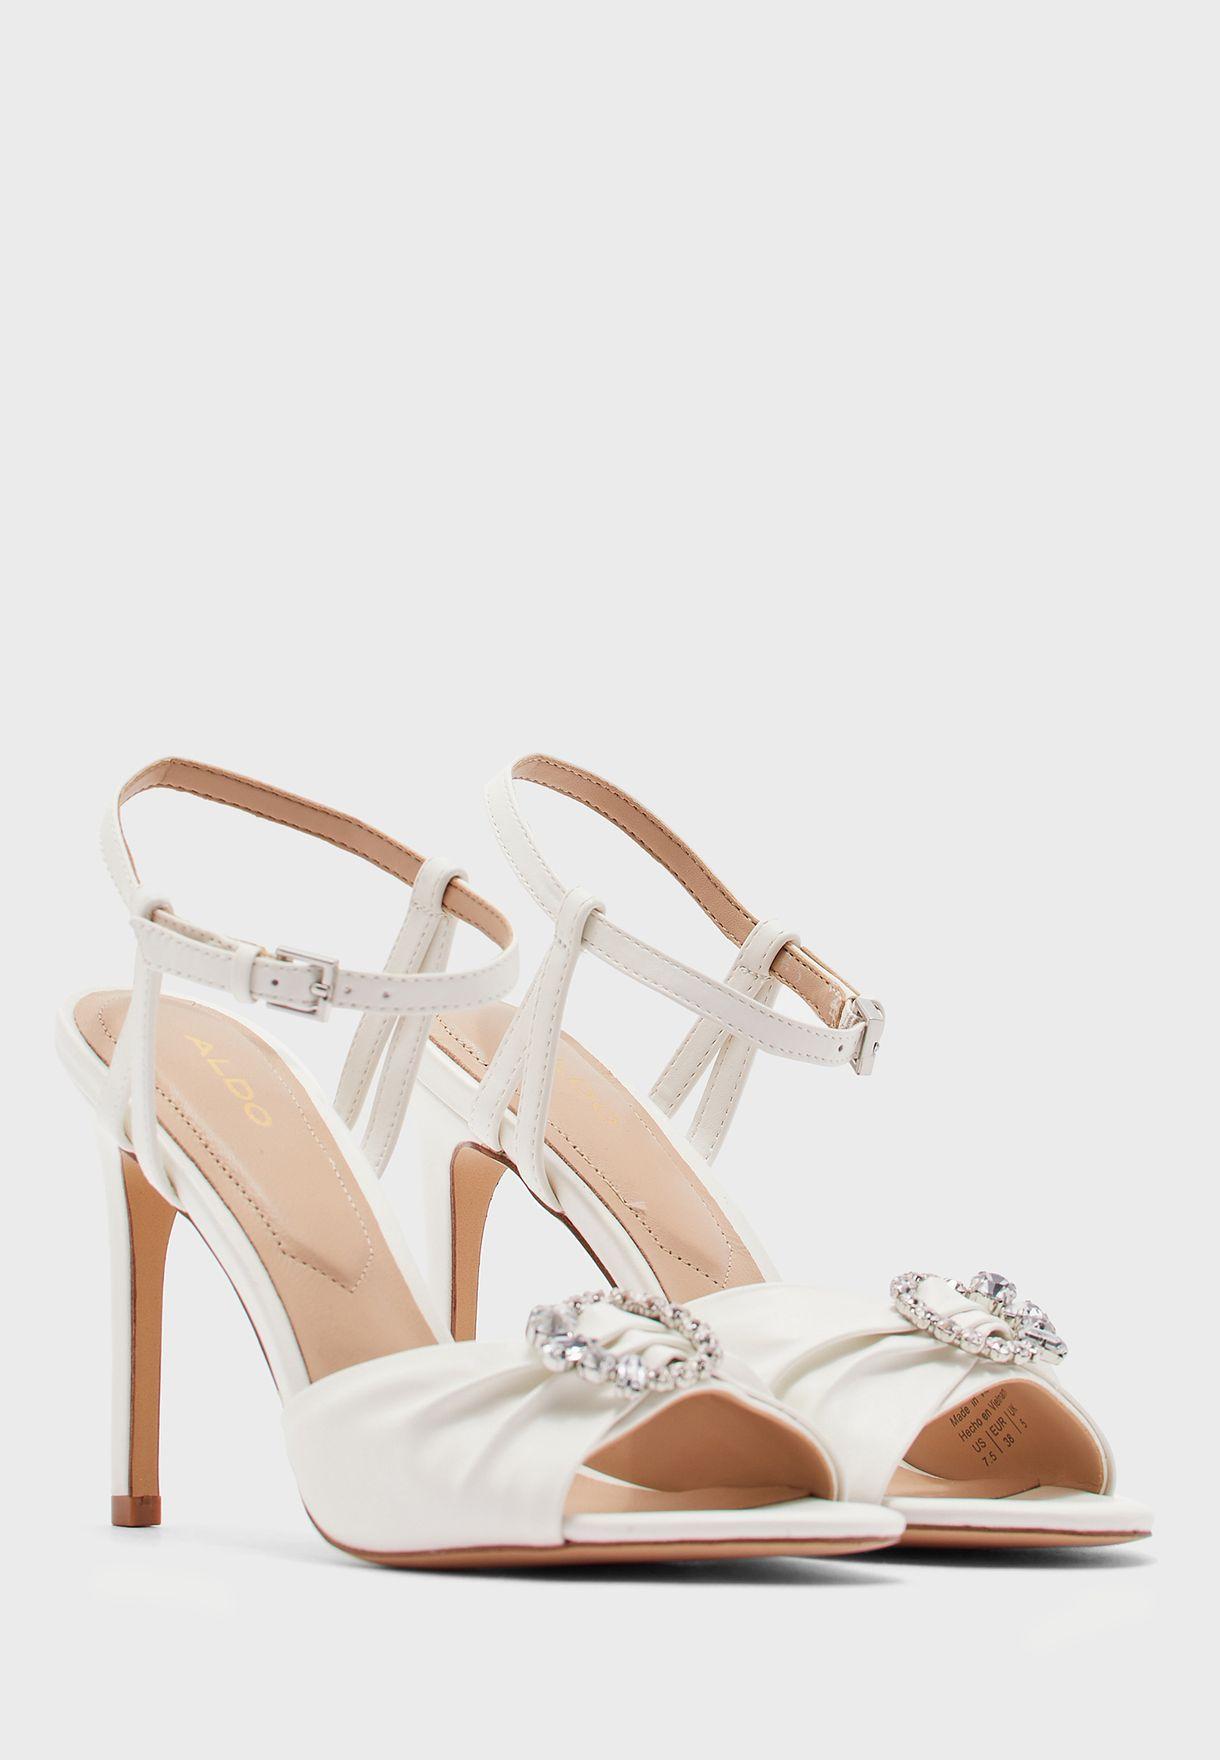 Zaossa Ankle Strap High Heel Sandal